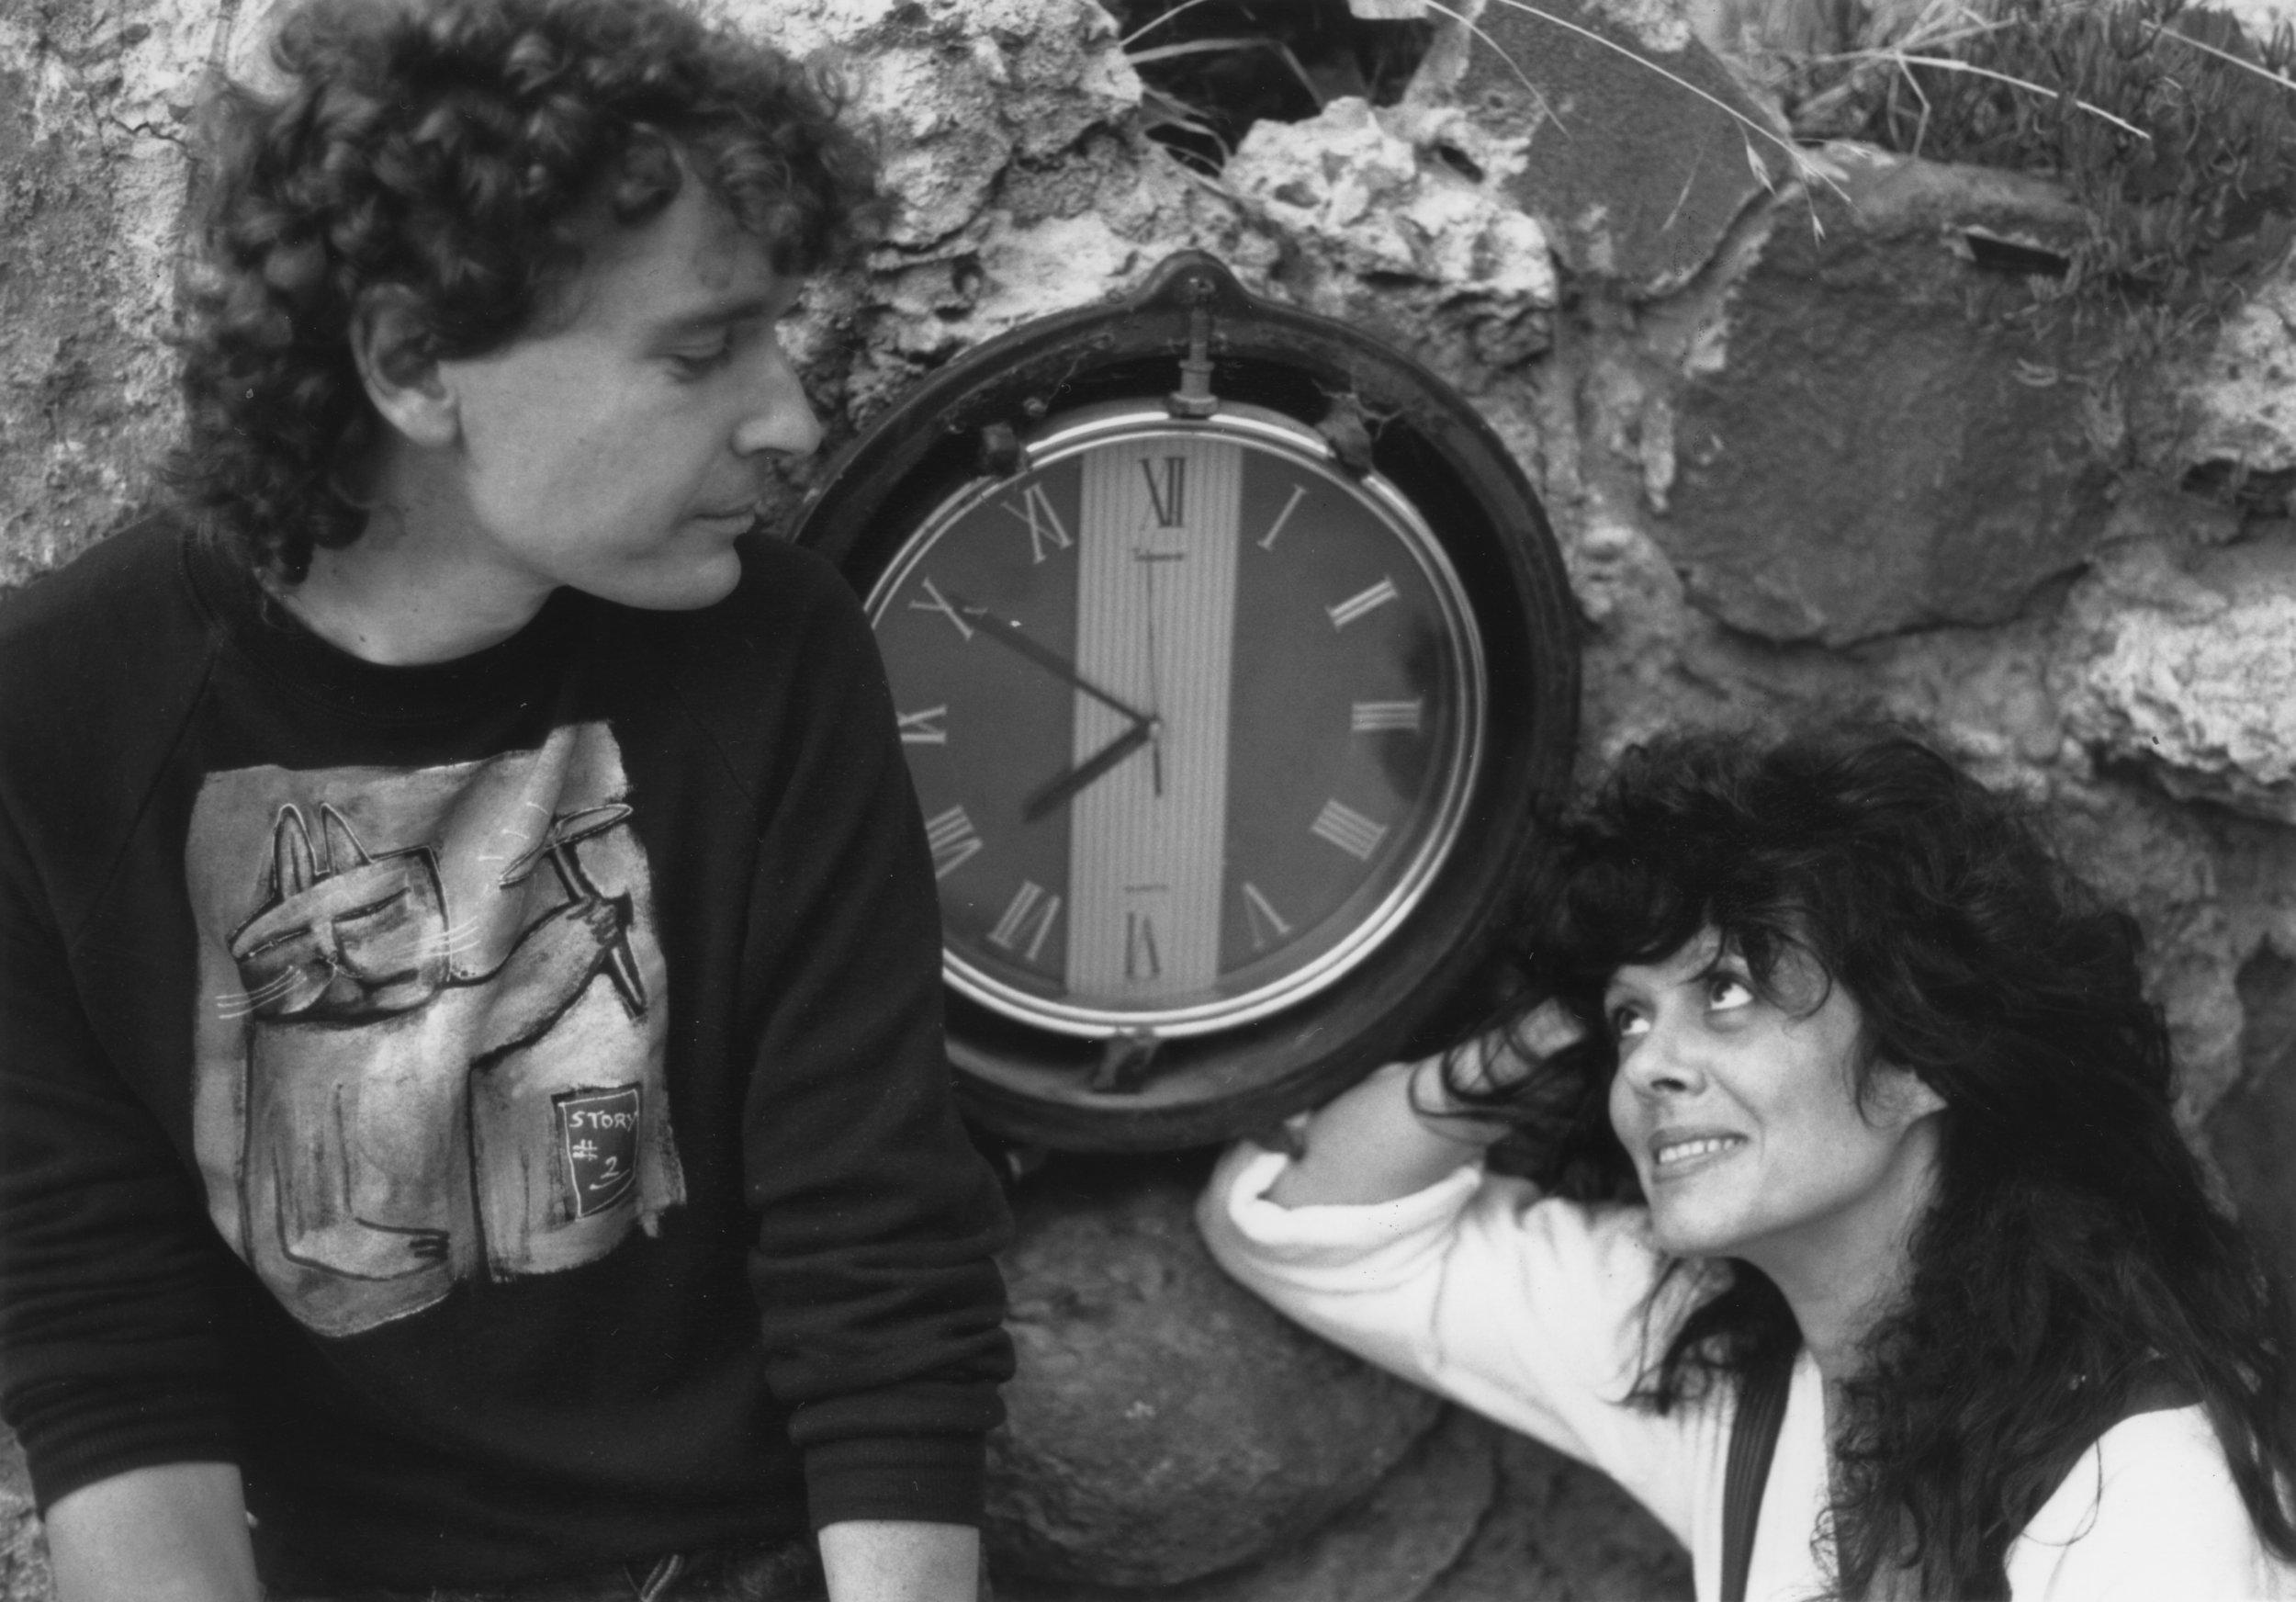 Maria&Frank-clockfix.jpg